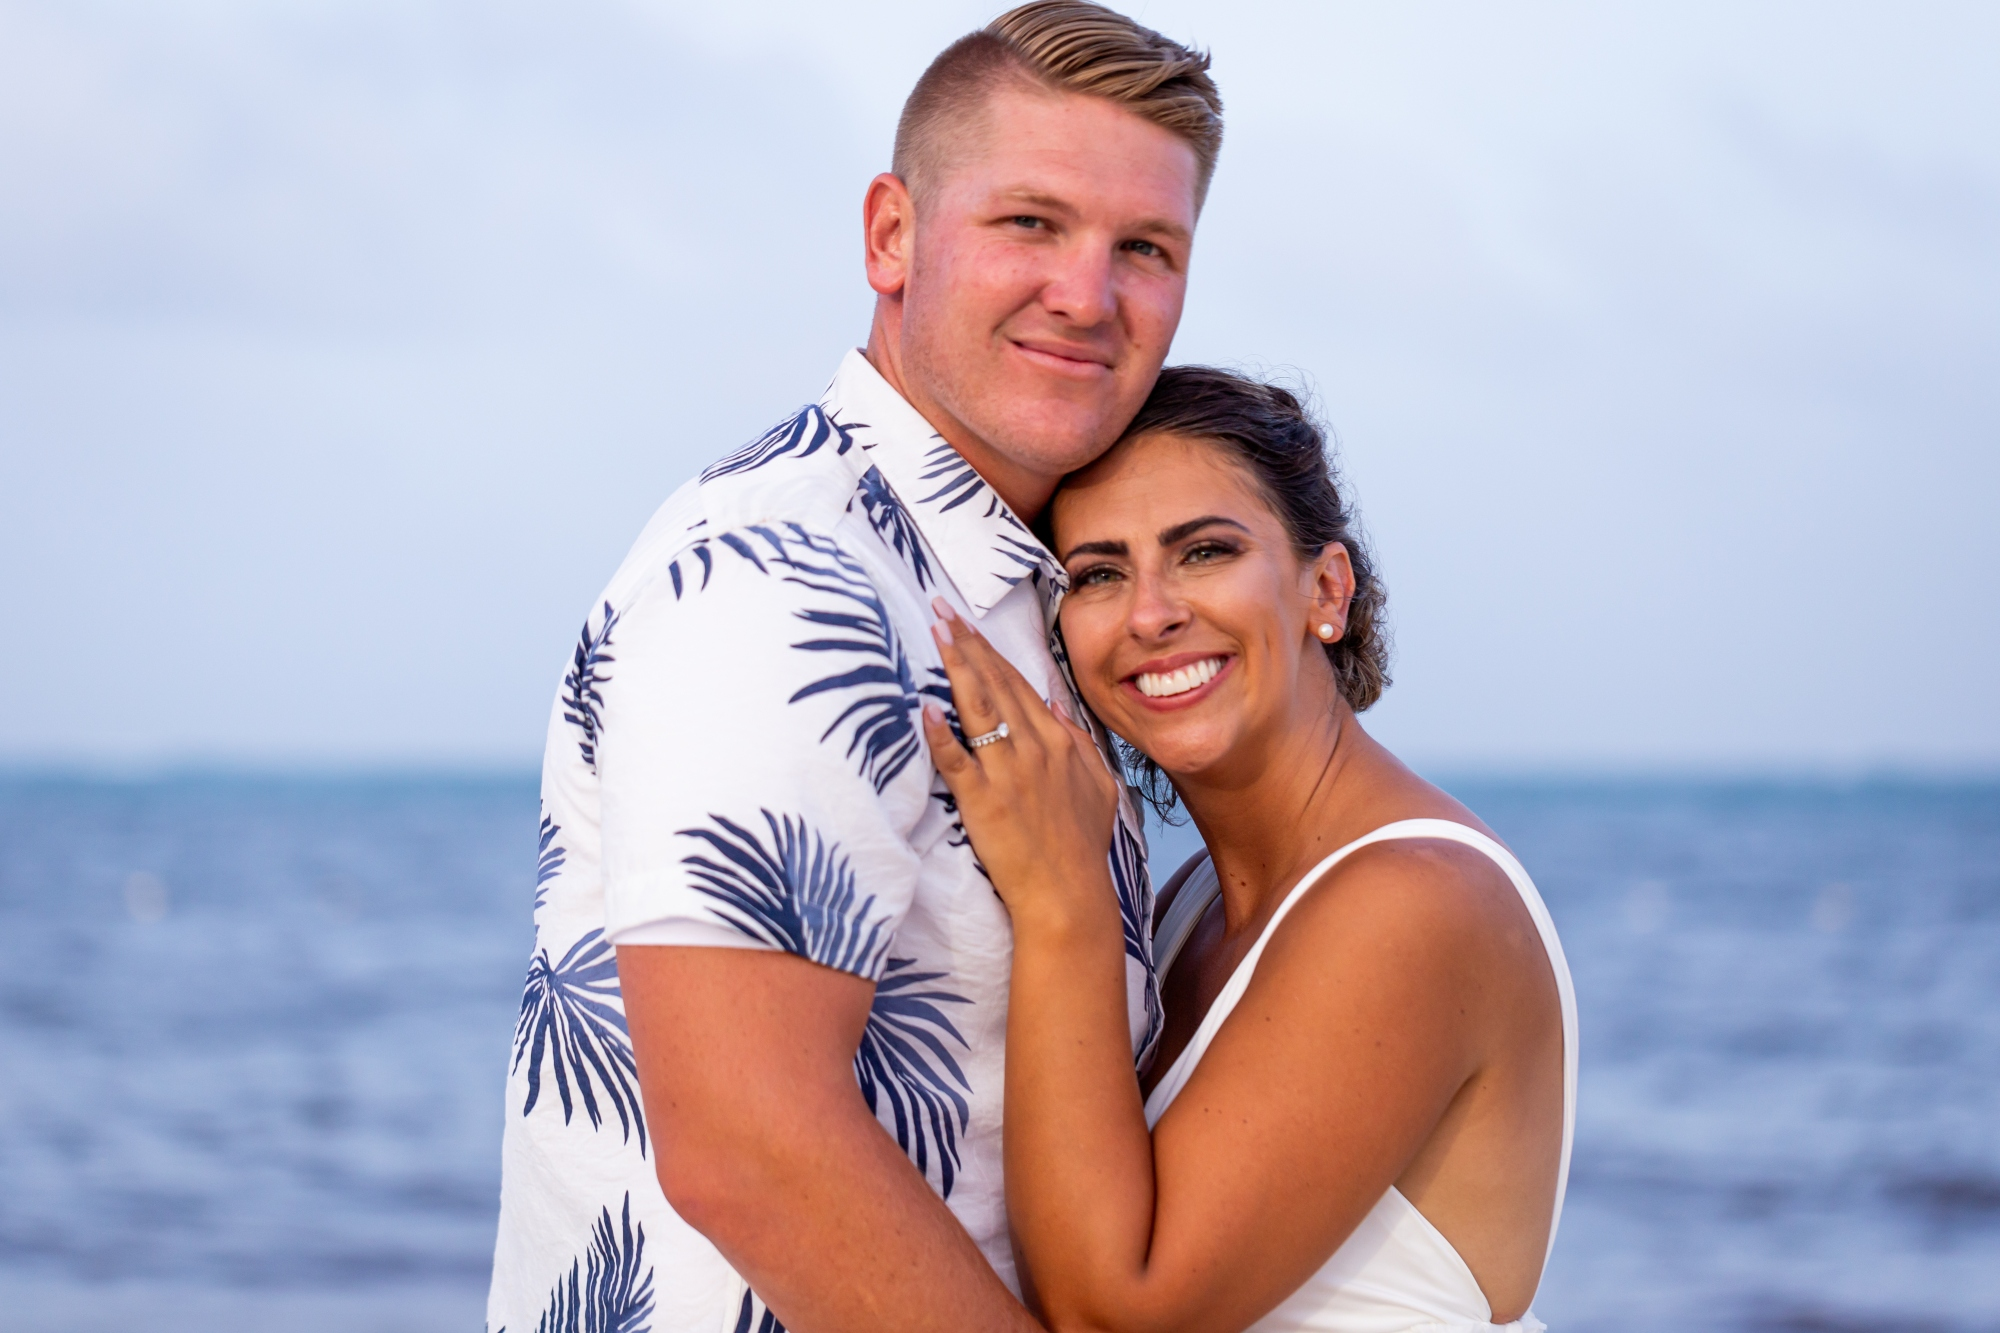 Newlyweds photo on a beach in cancun